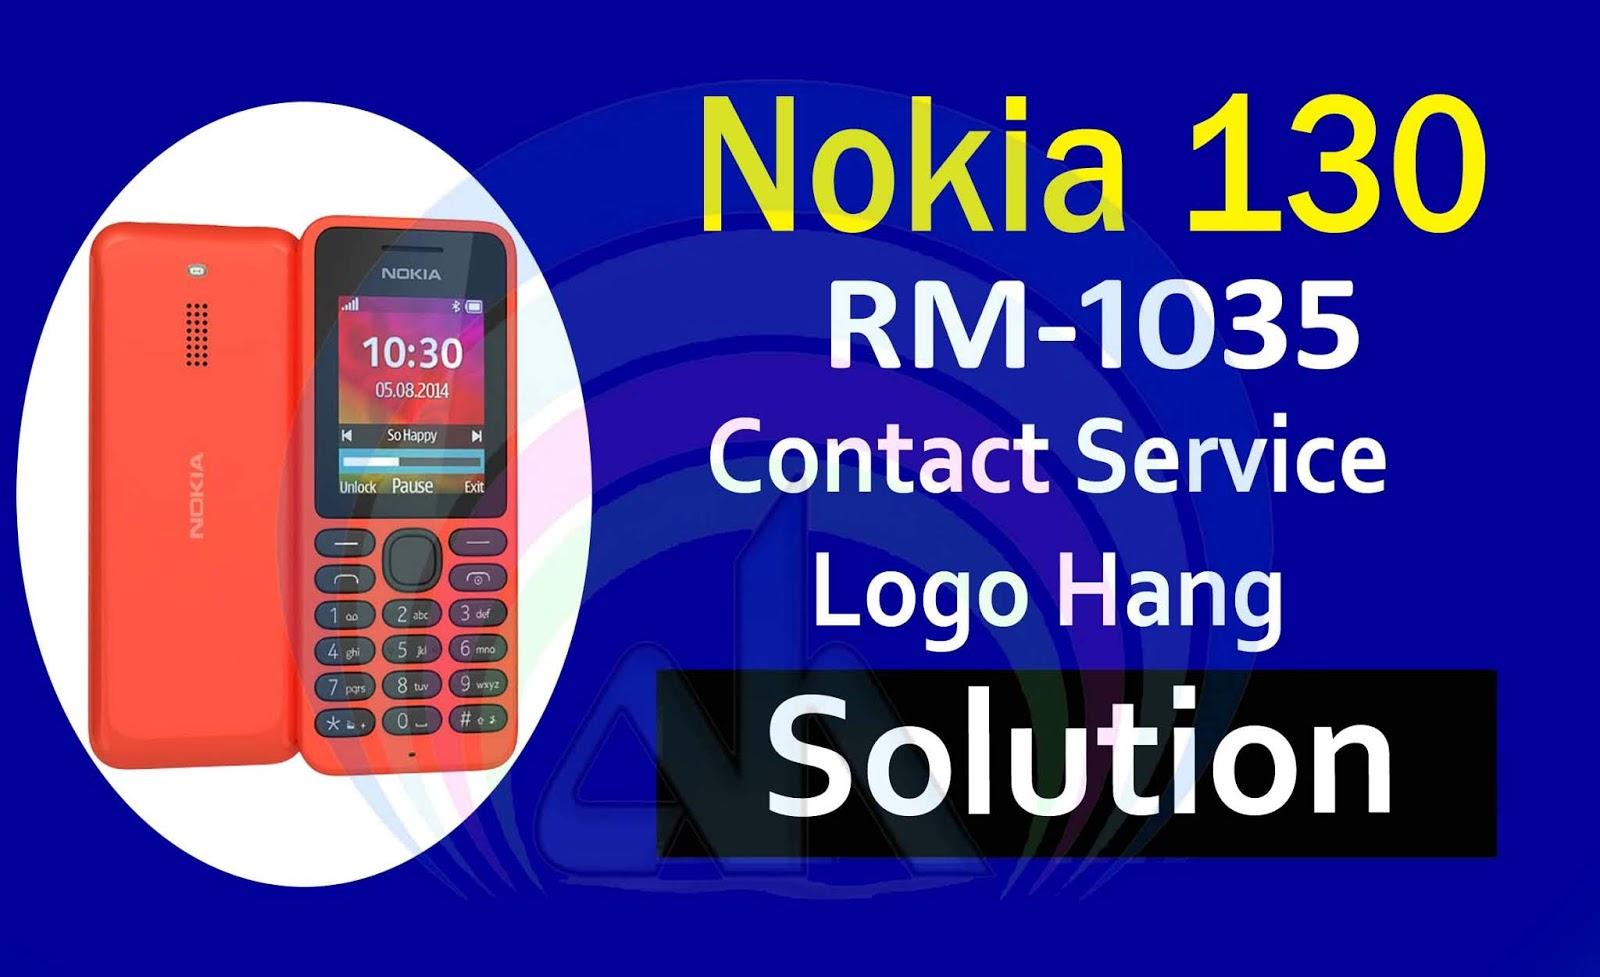 Nokia 130 RM-1035 Blinking on Nokia Logo and Contact Service